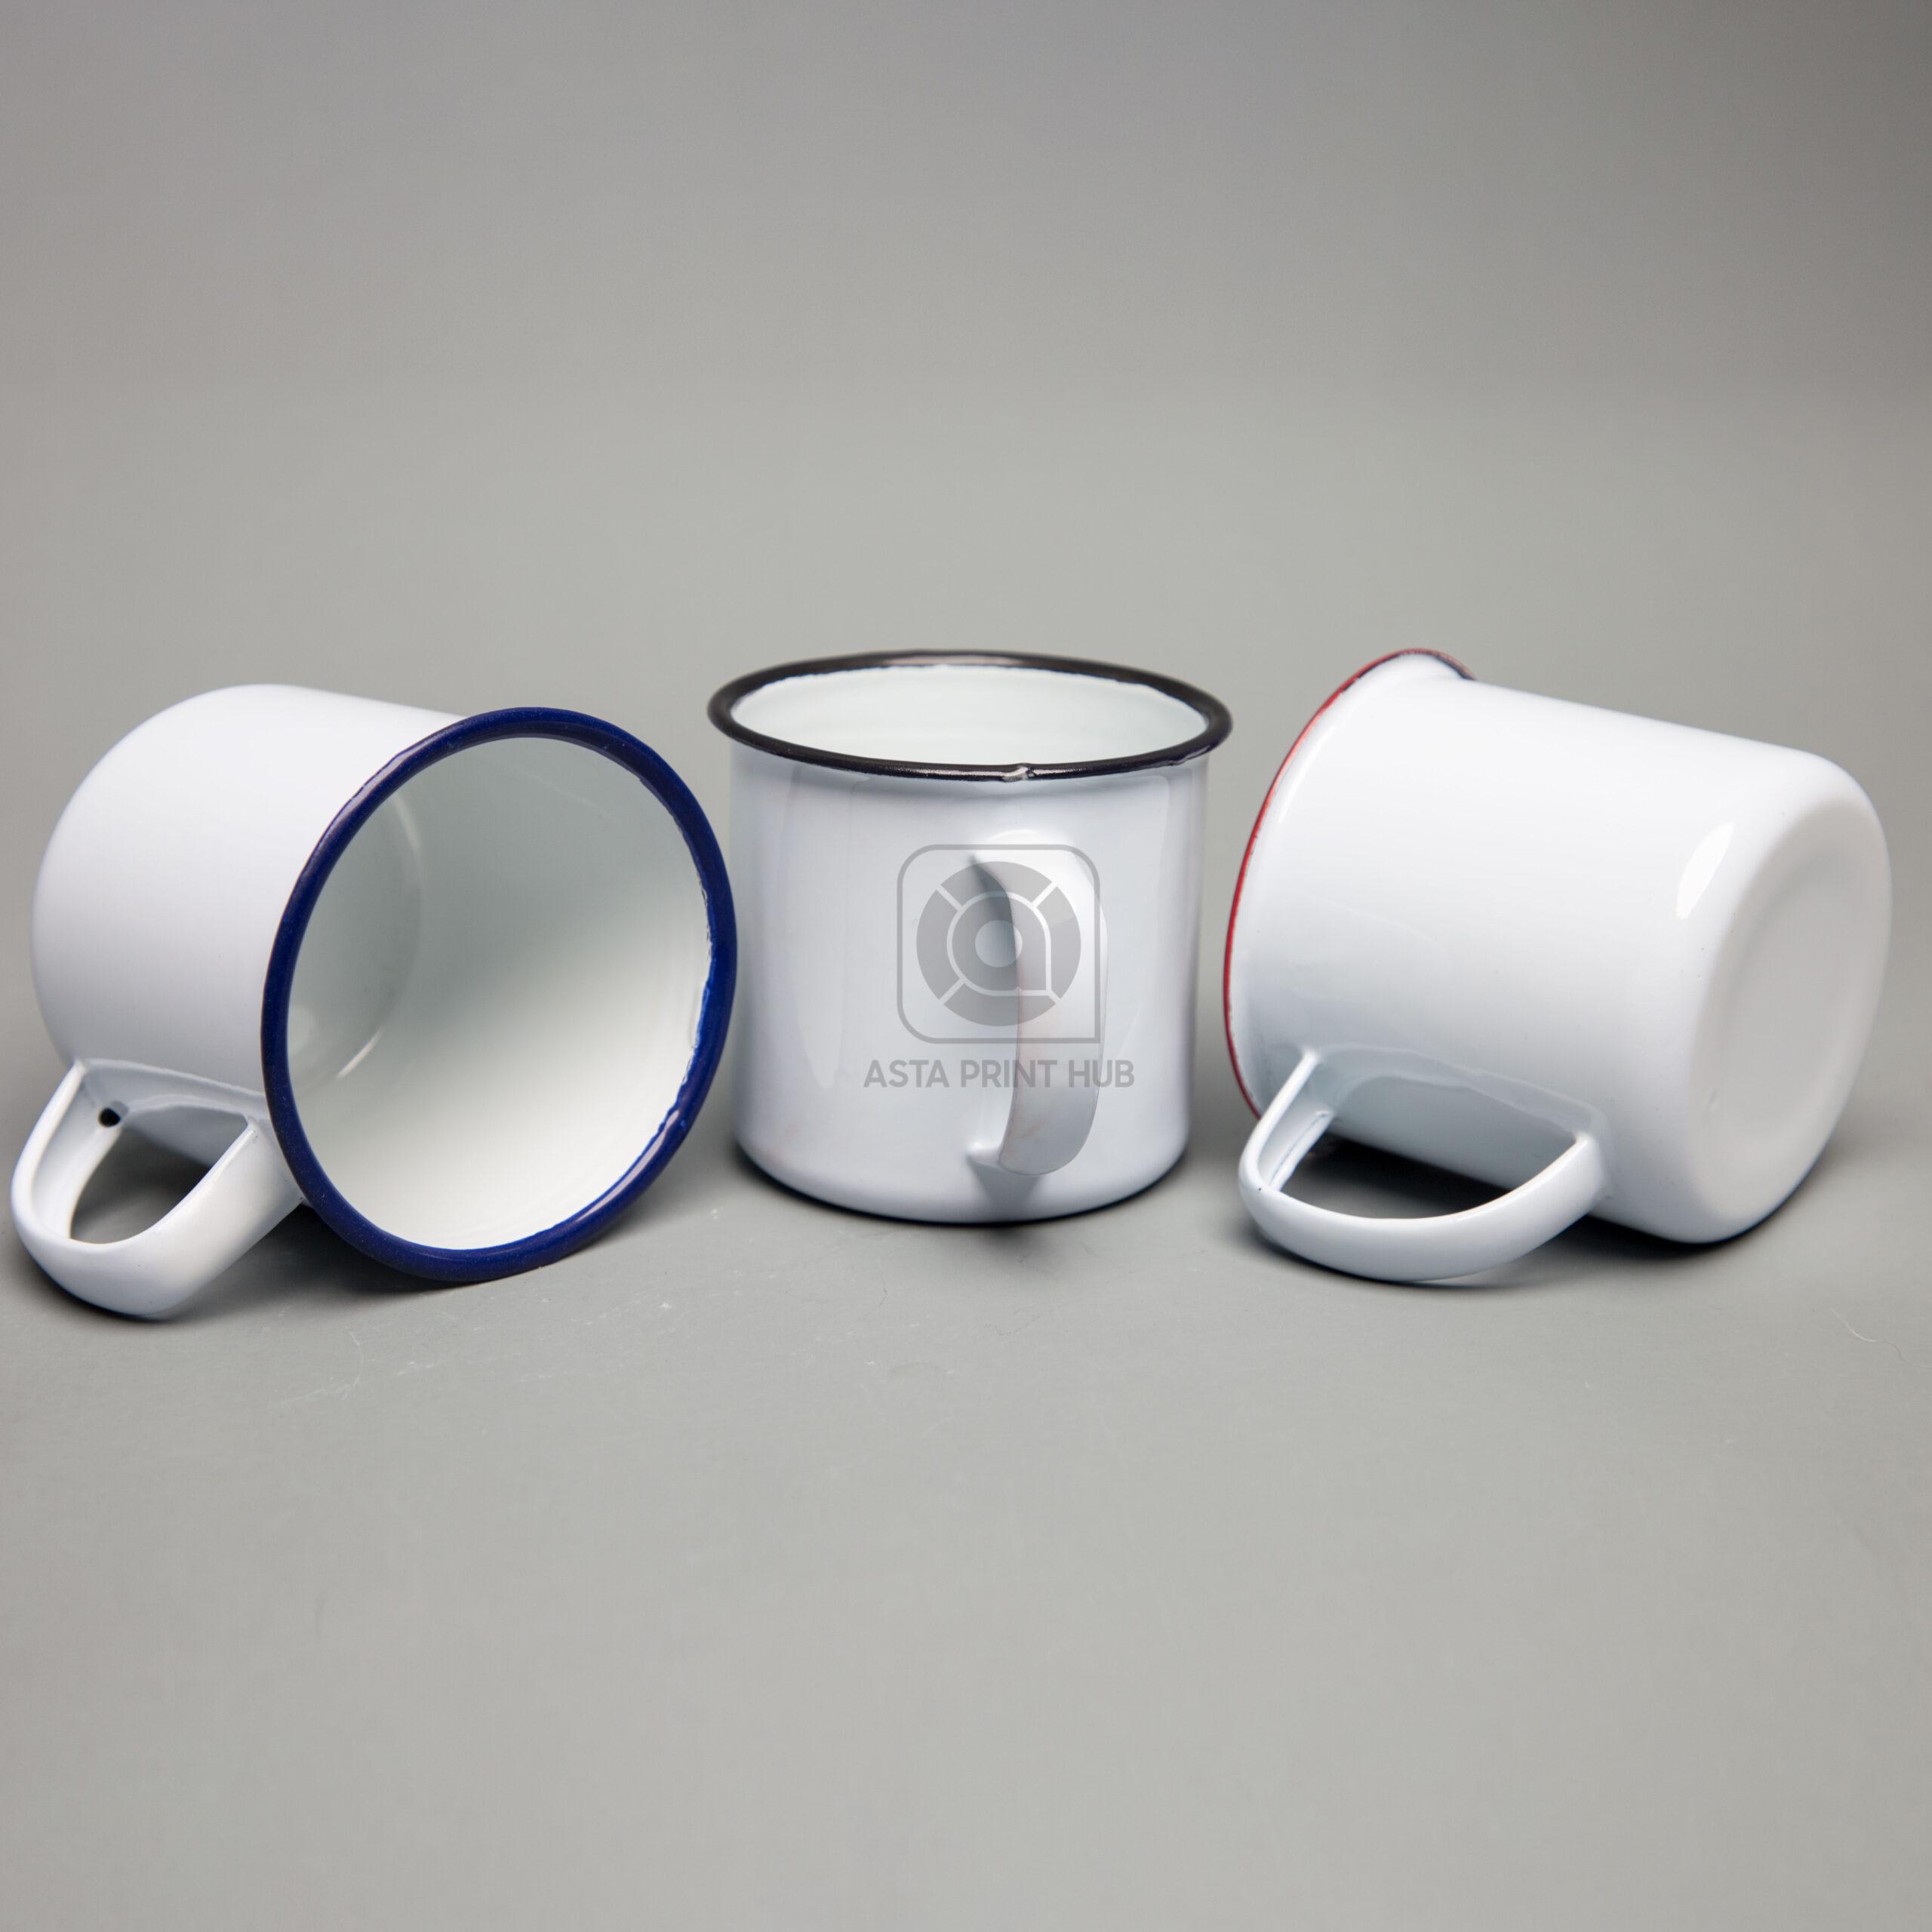 astaprinthub-items-9786756 (3)